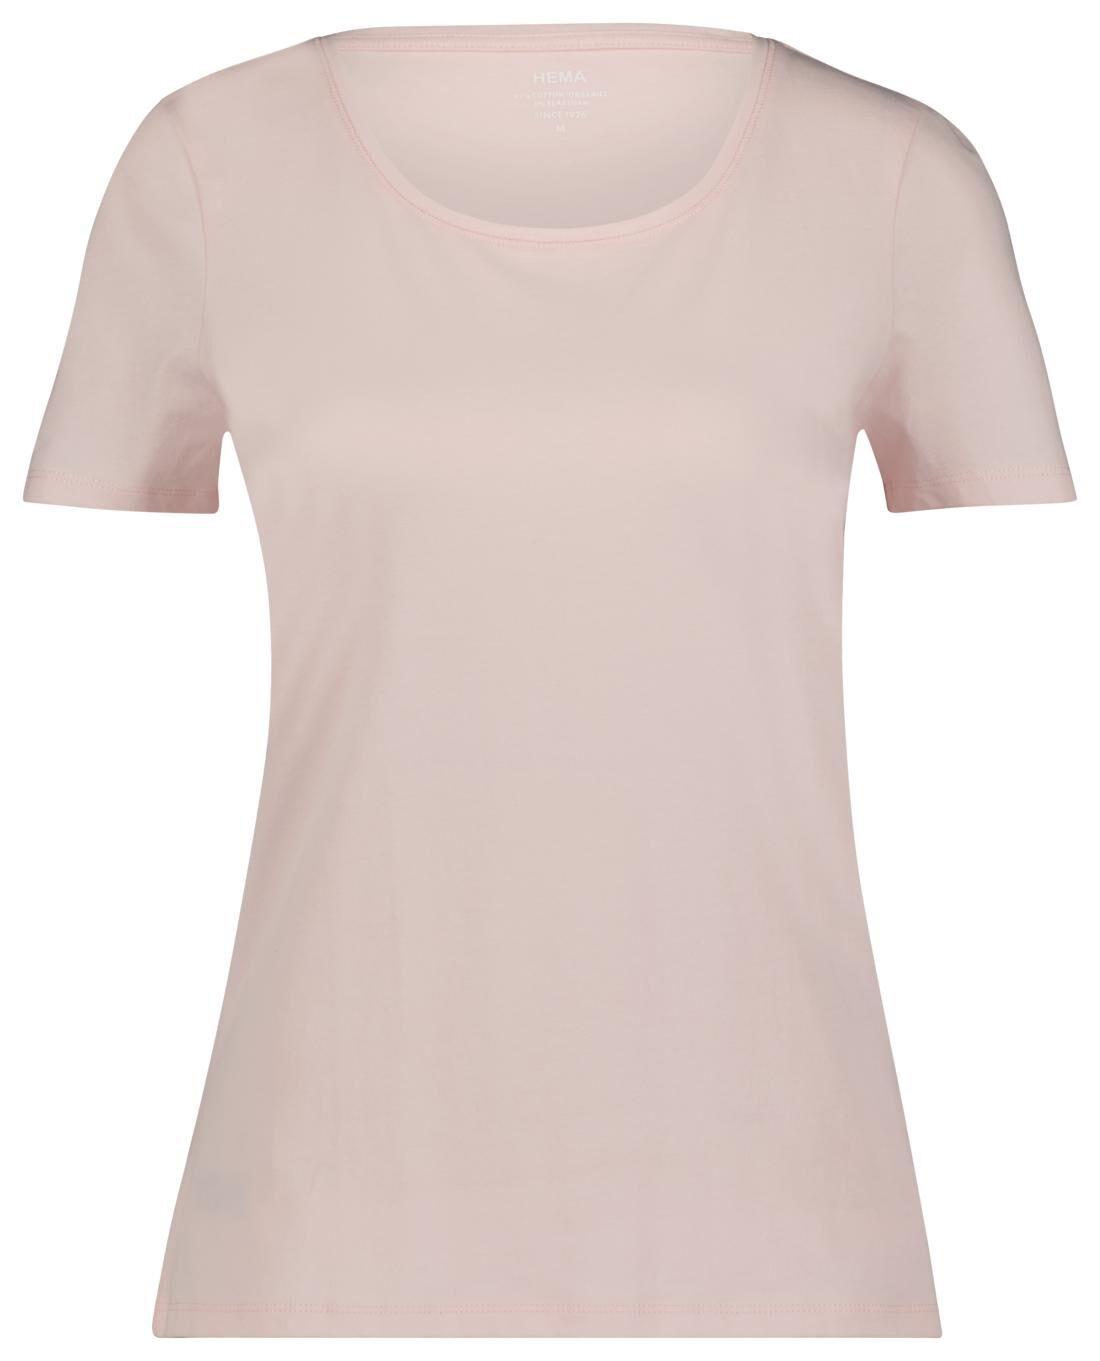 HEMA Dames Basic T-shirt Lichtroze (lichtroze)